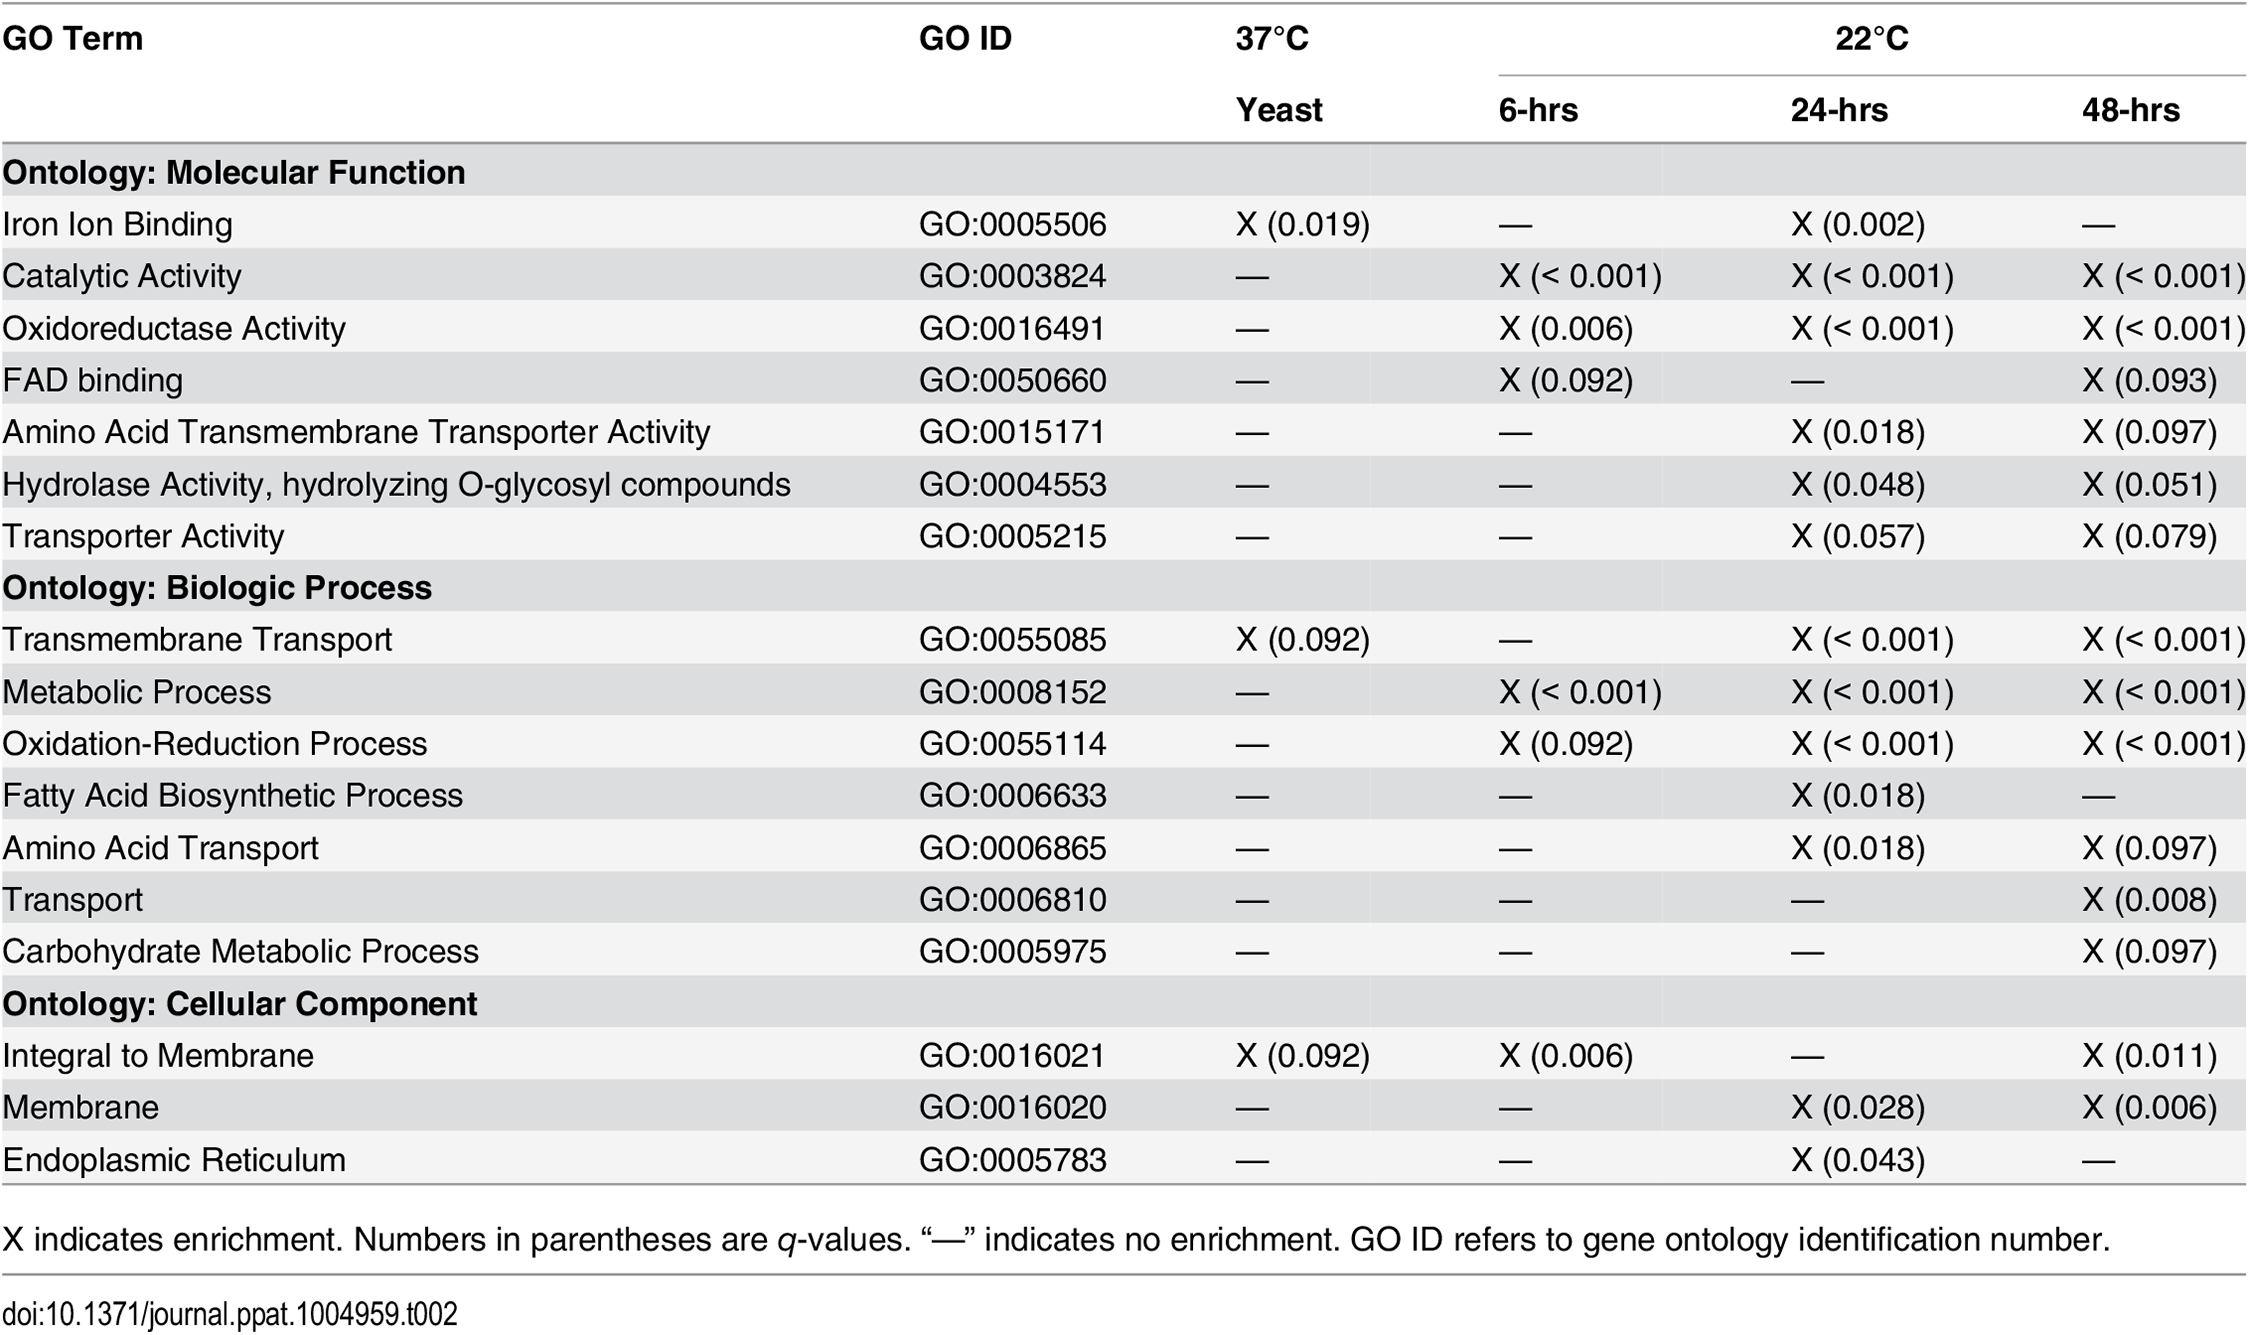 Gene ontology (GO) enrichment analysis.